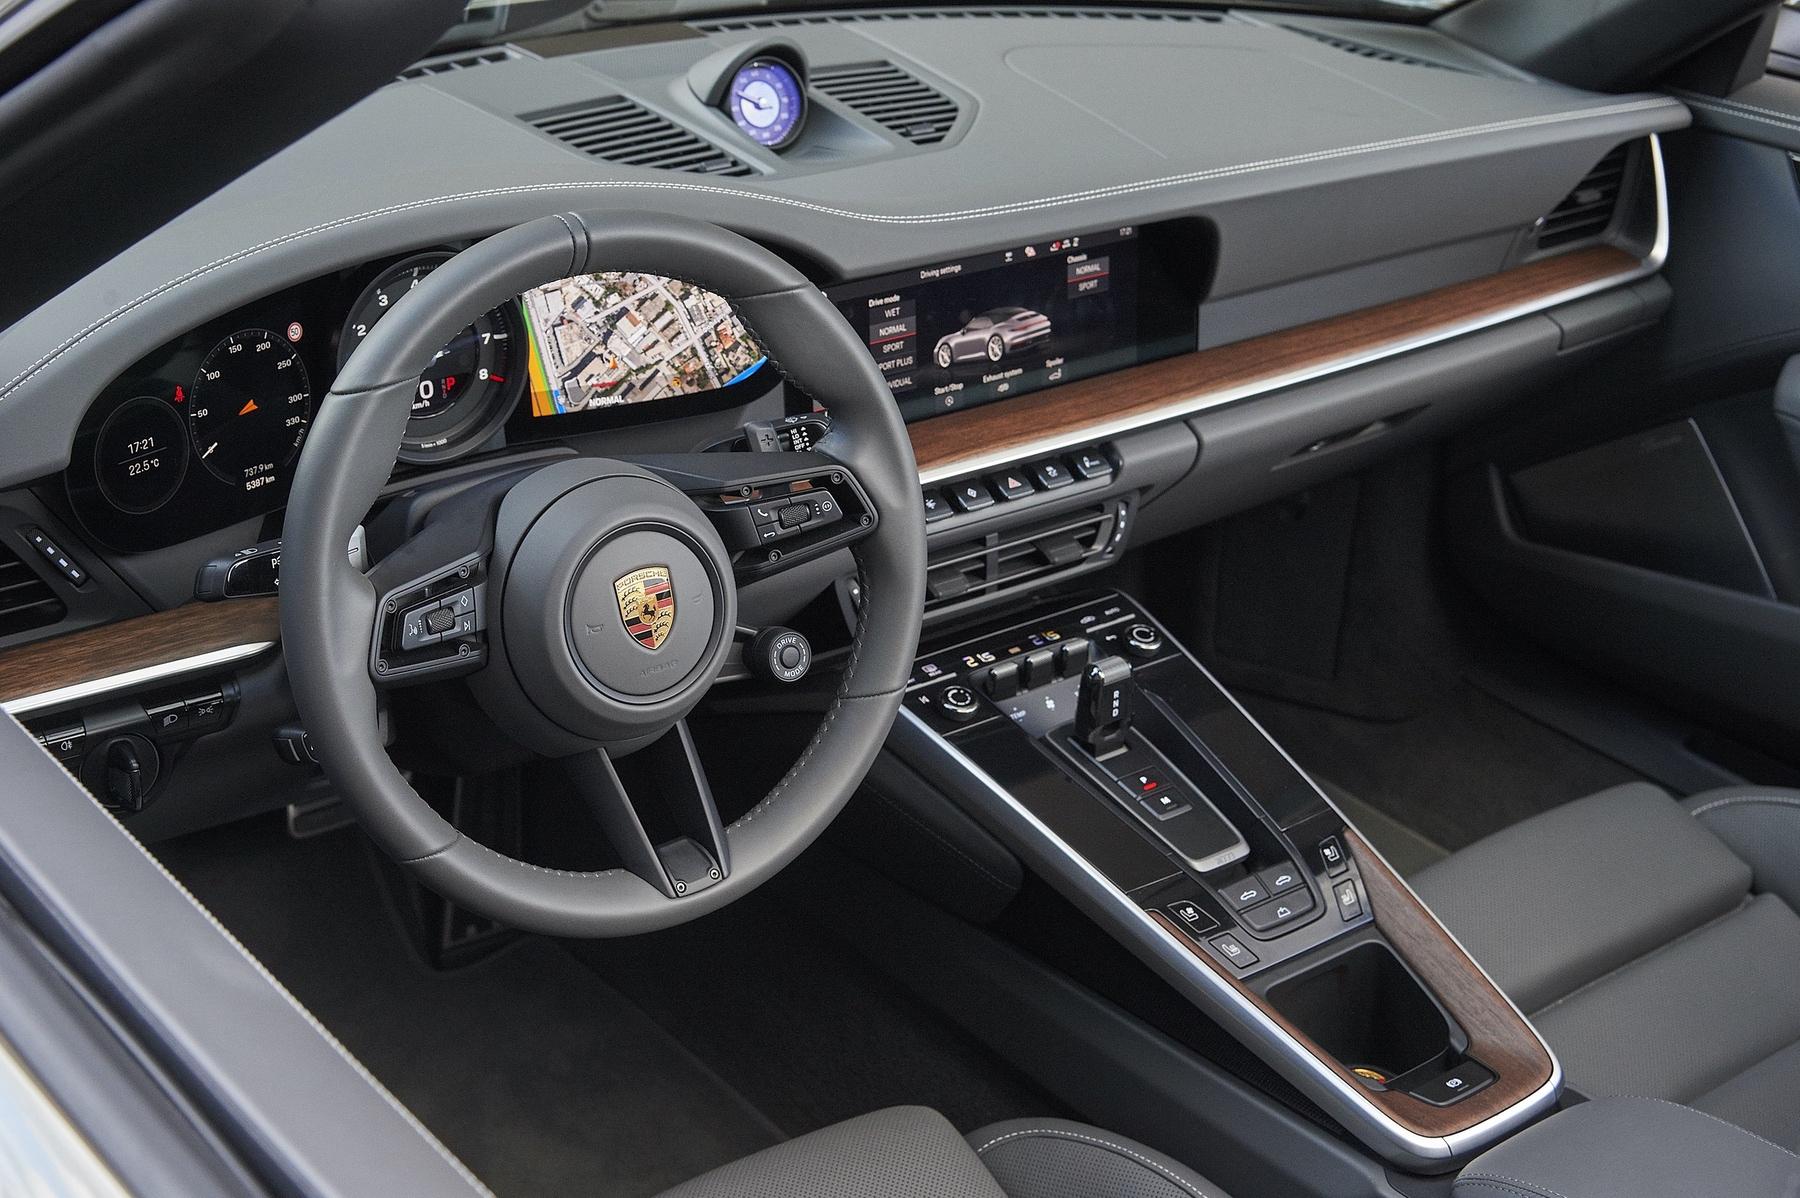 Test_Drive_Porsche_911_Athens_0166